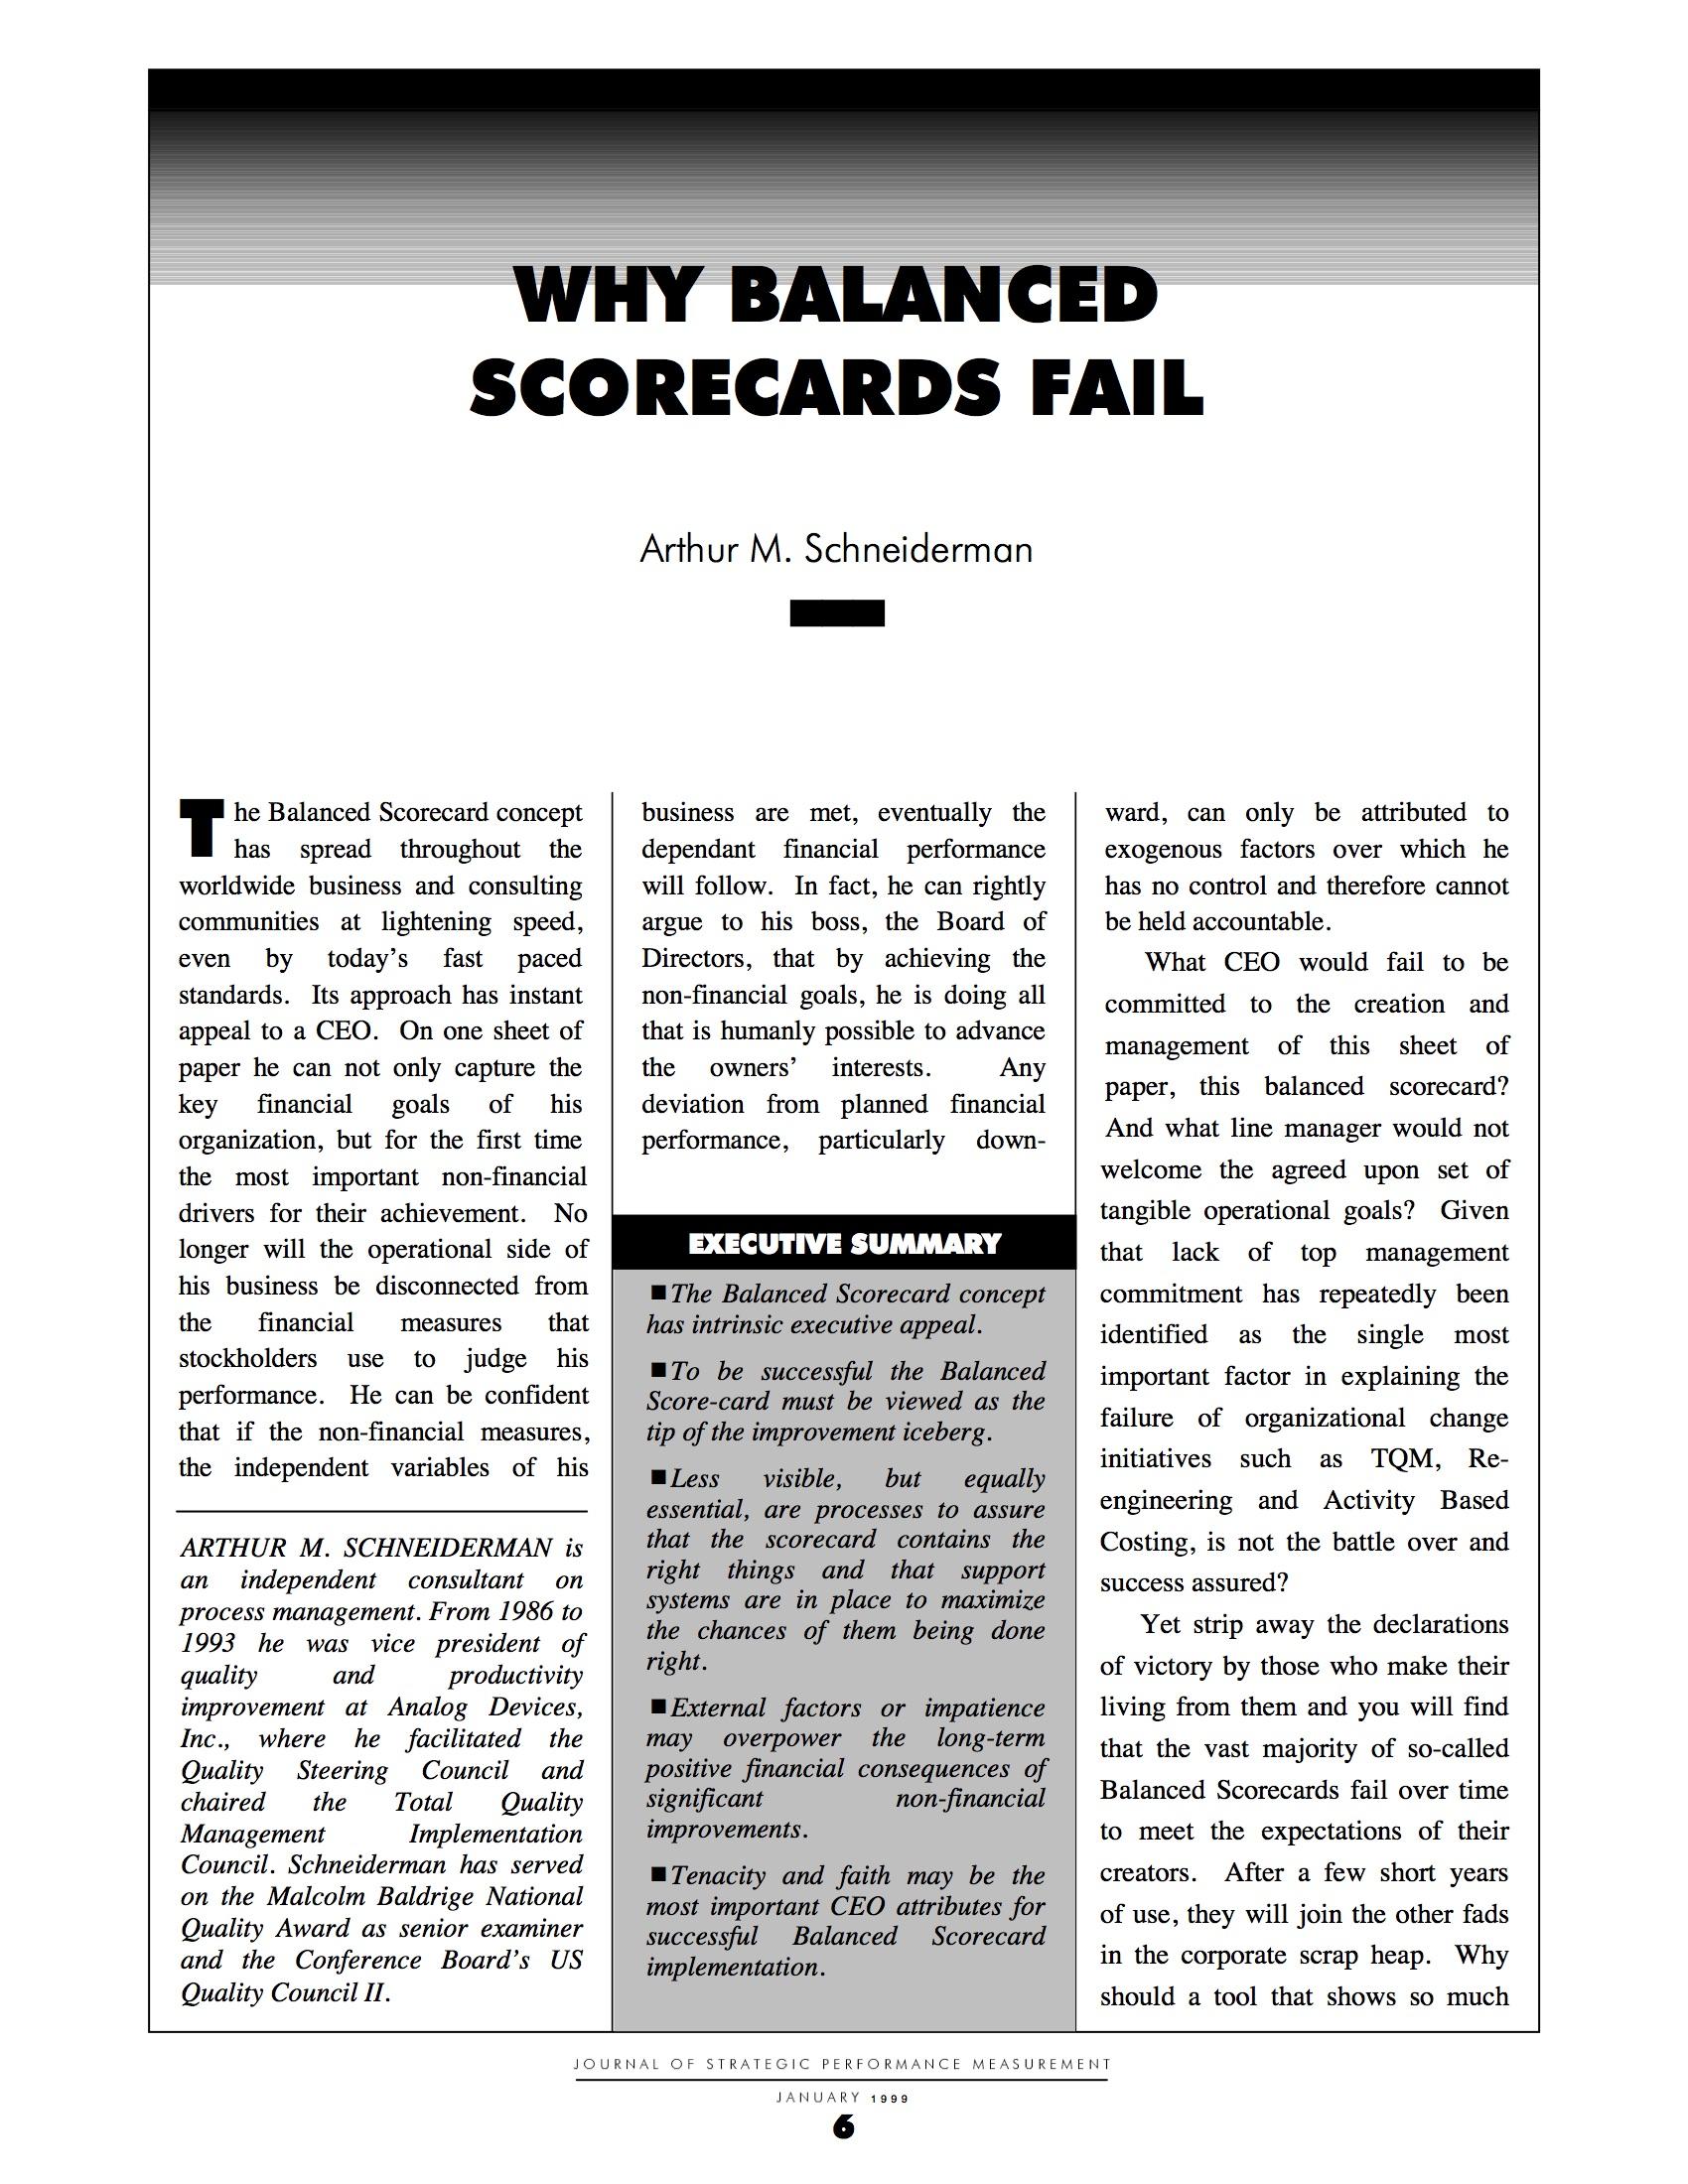 Why Balanced Scorecards Fail!